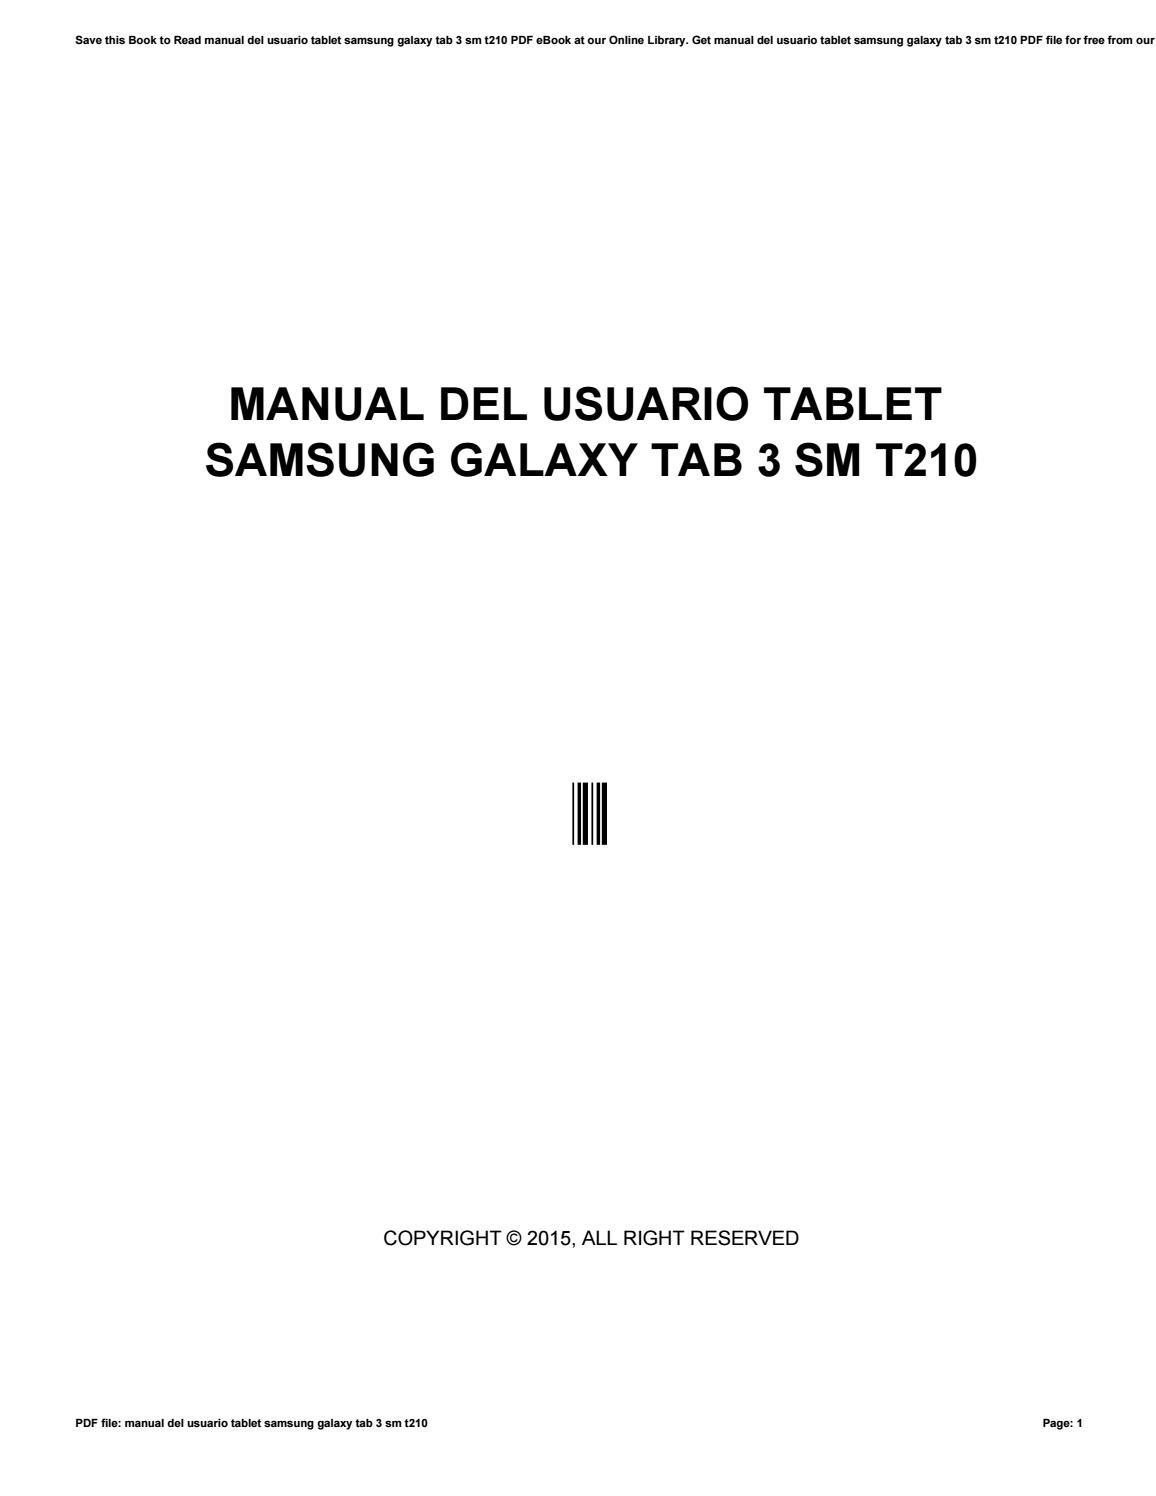 Manual del usuario tablet samsung galaxy tab 3 sm t210 by monadi1 - issuu